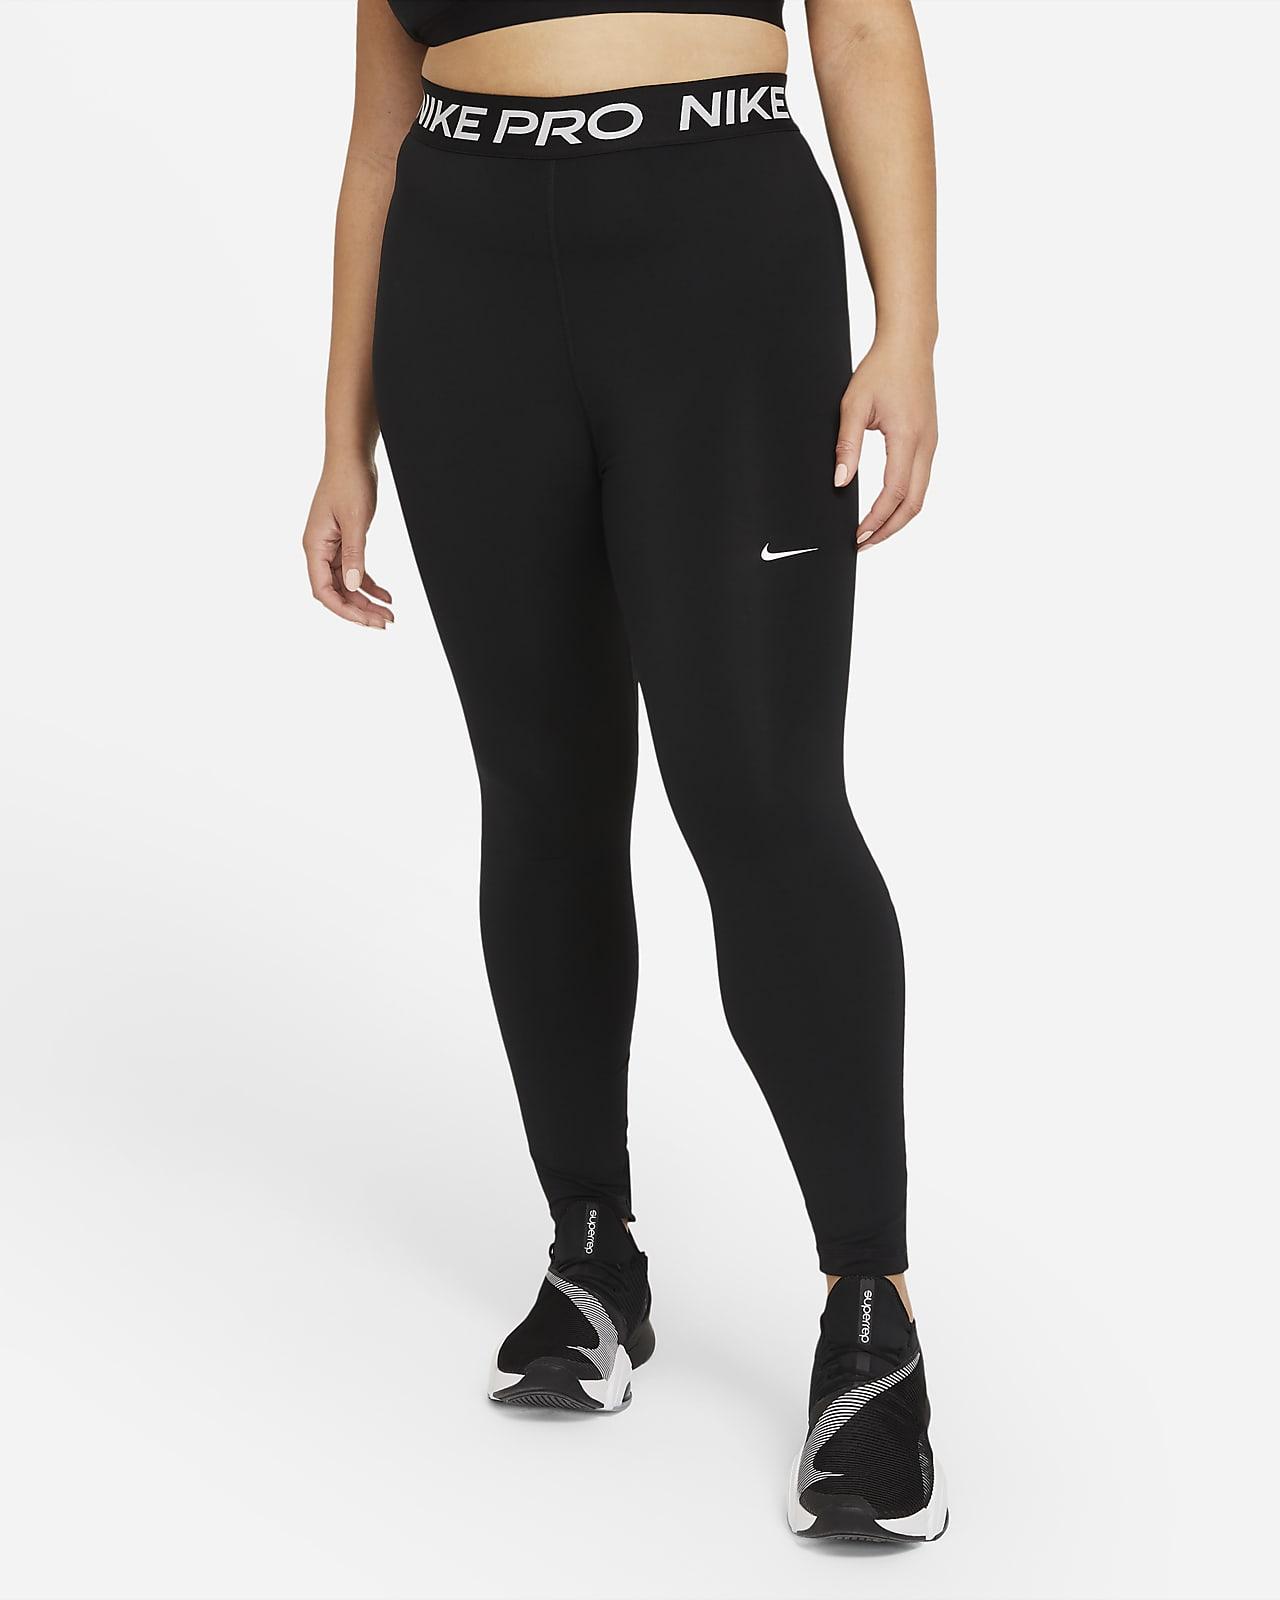 Nike Pro 365 Leggings (Talla grande) - Mujer